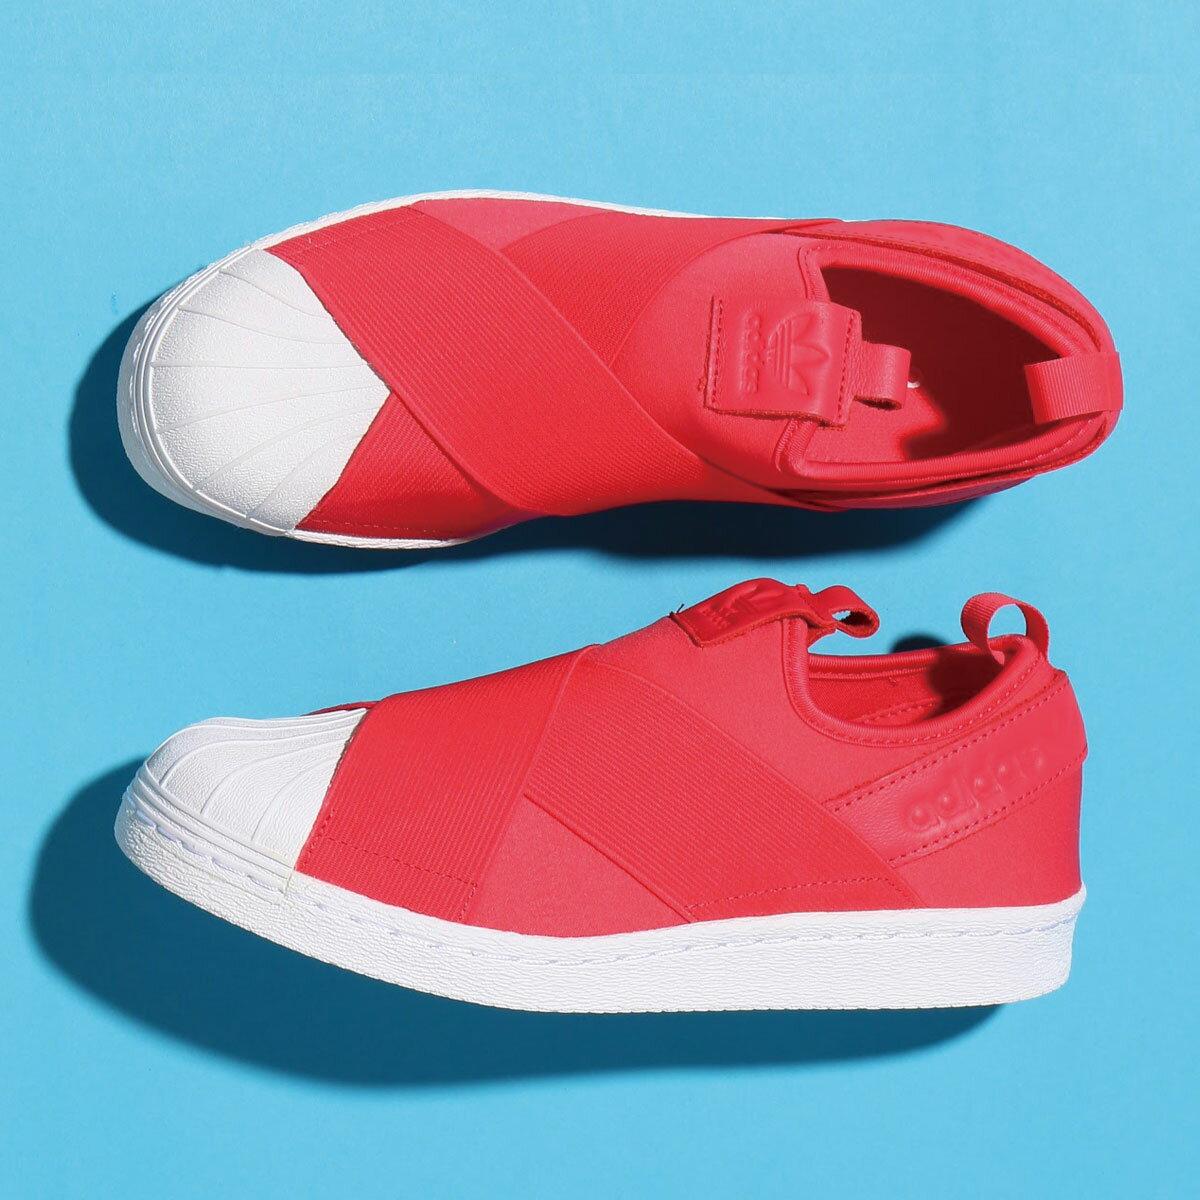 adidas Originals SUPERSTAR SlipOn W (アディダス スーパースター スリップオン W)CORE PINK/CORE PINK/RUNNING WHITE【レディース スニーカー】17SS-I